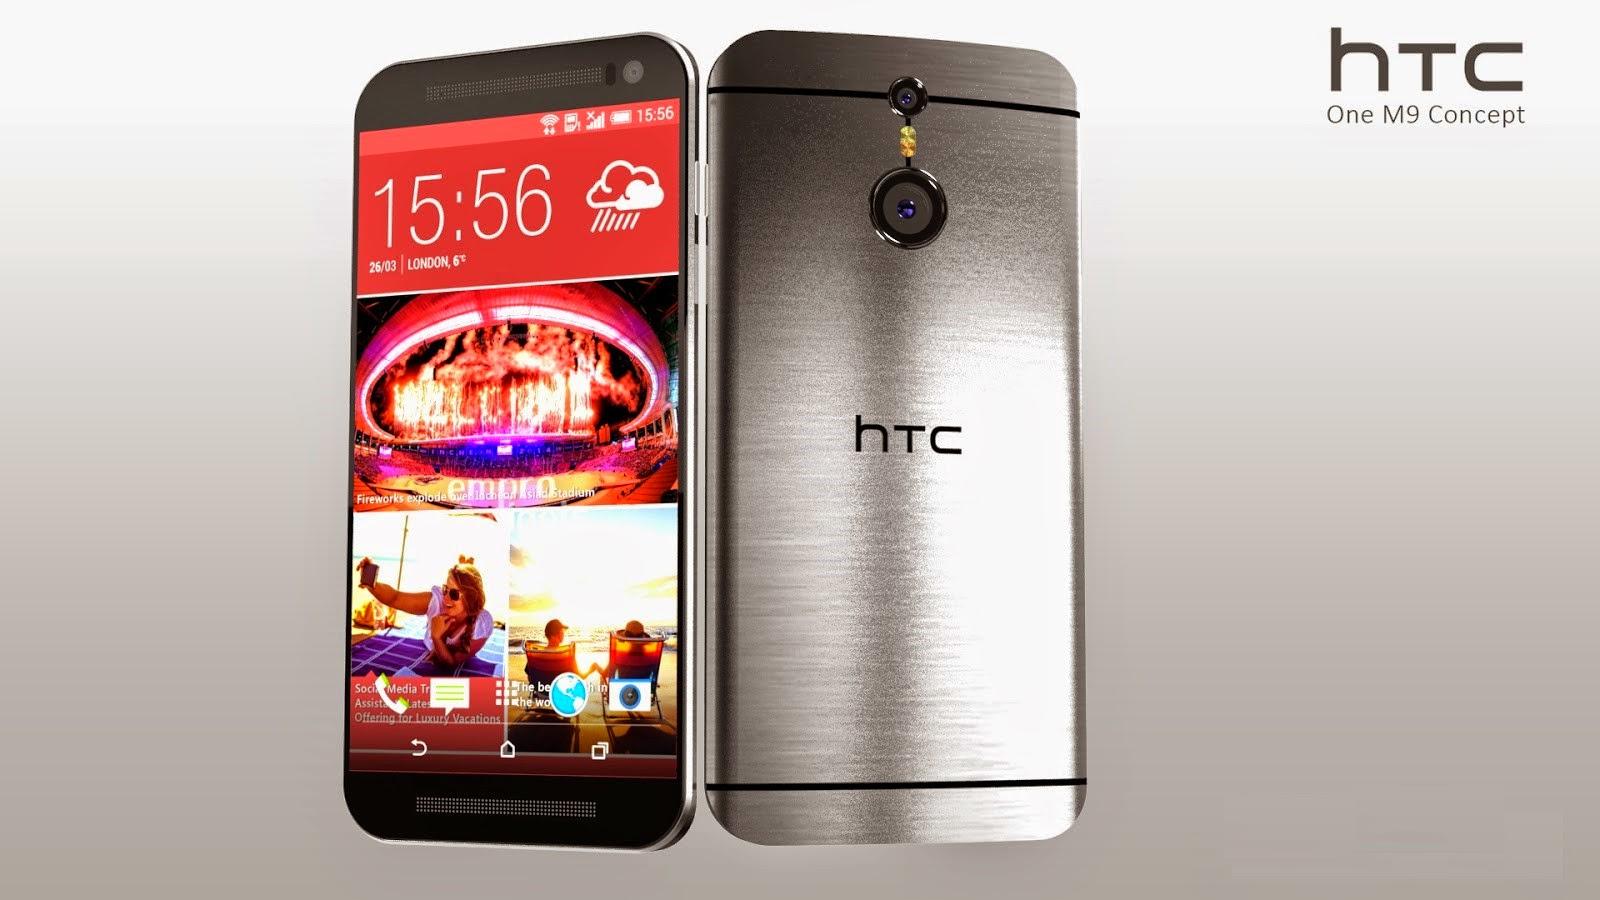 HTC One M9 dilengkapi kamera 20 MP